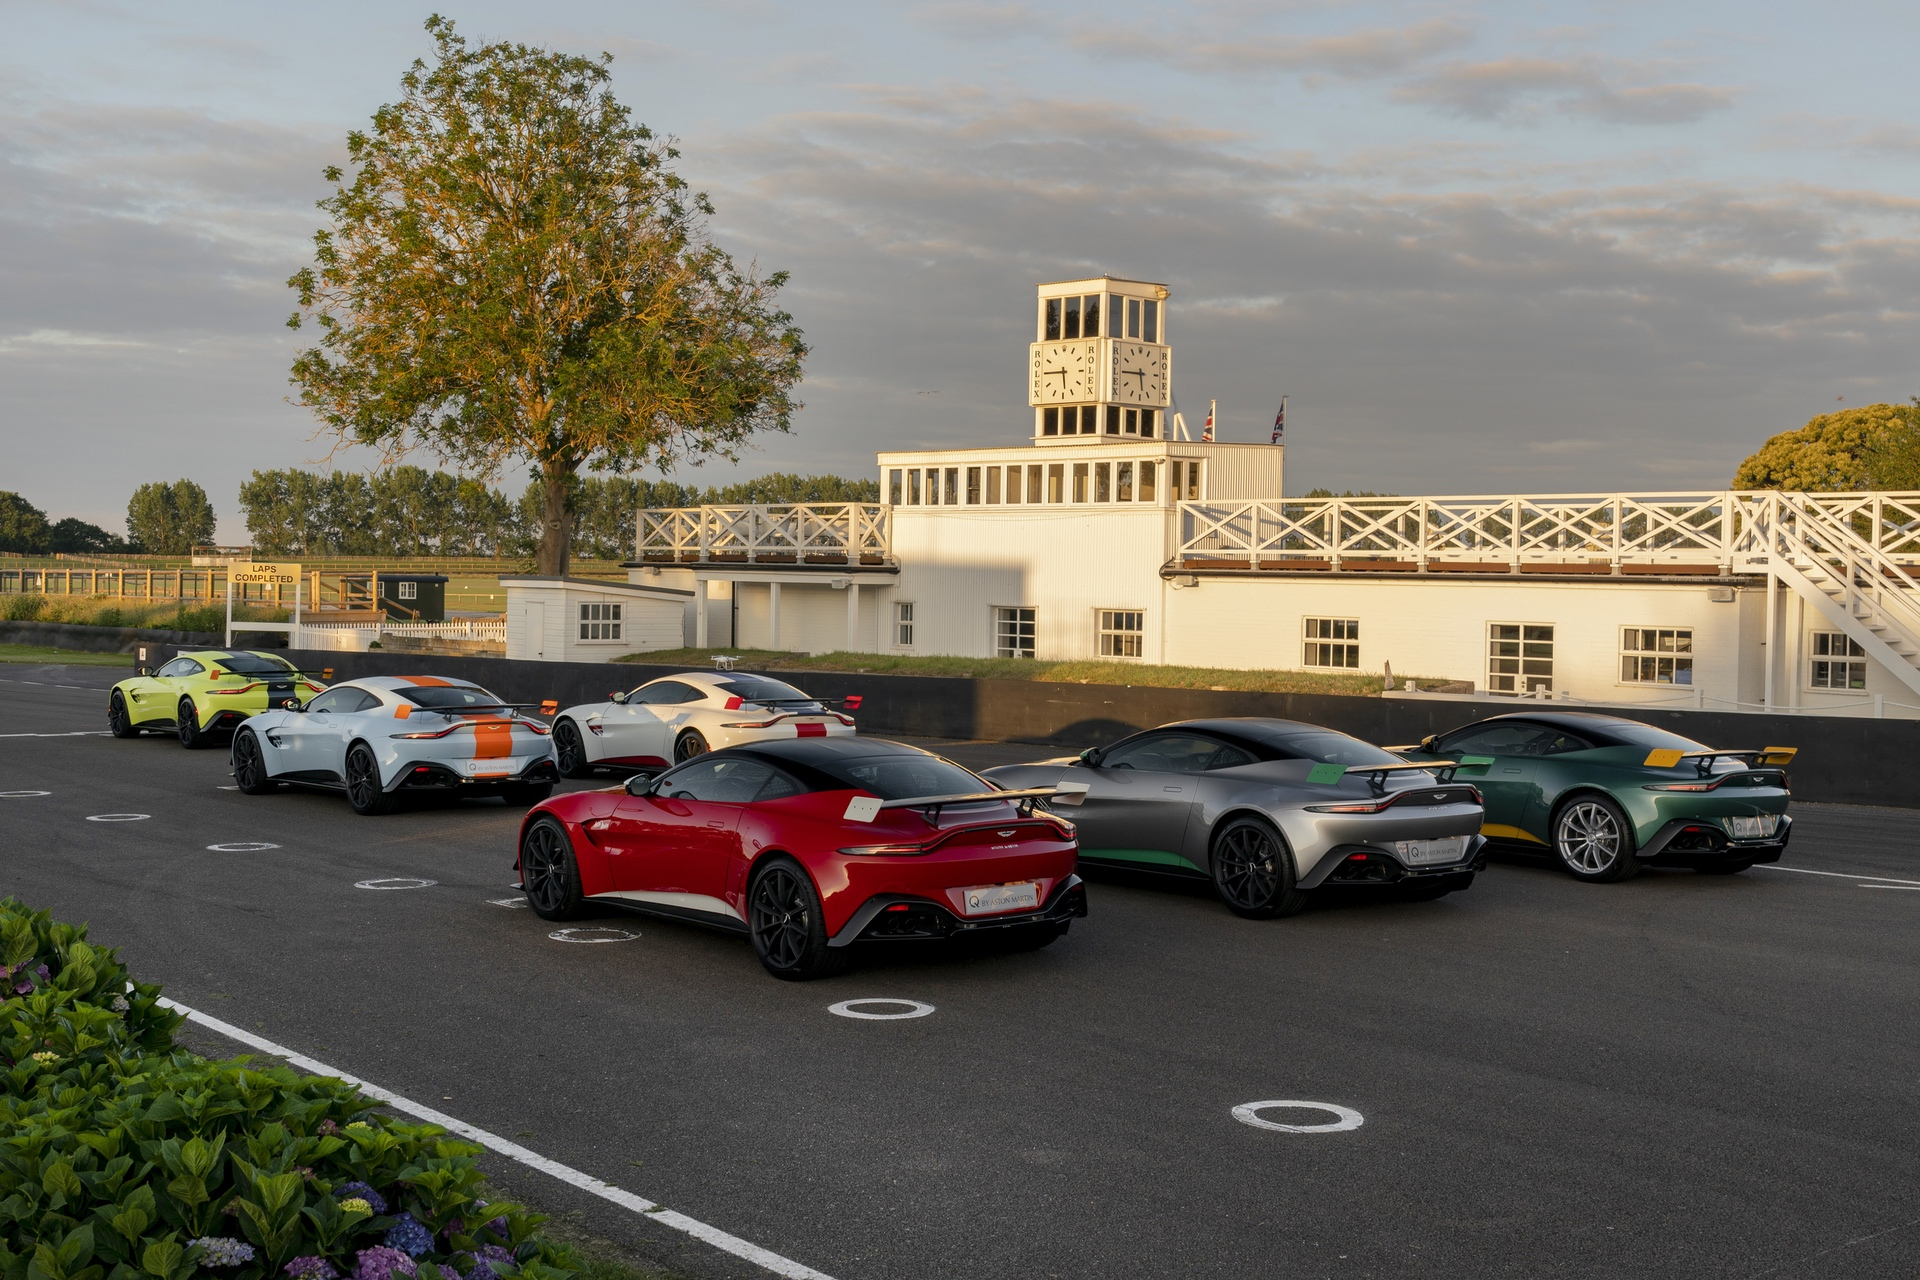 Aston-Martin_Goodwood-FoS-2019_07